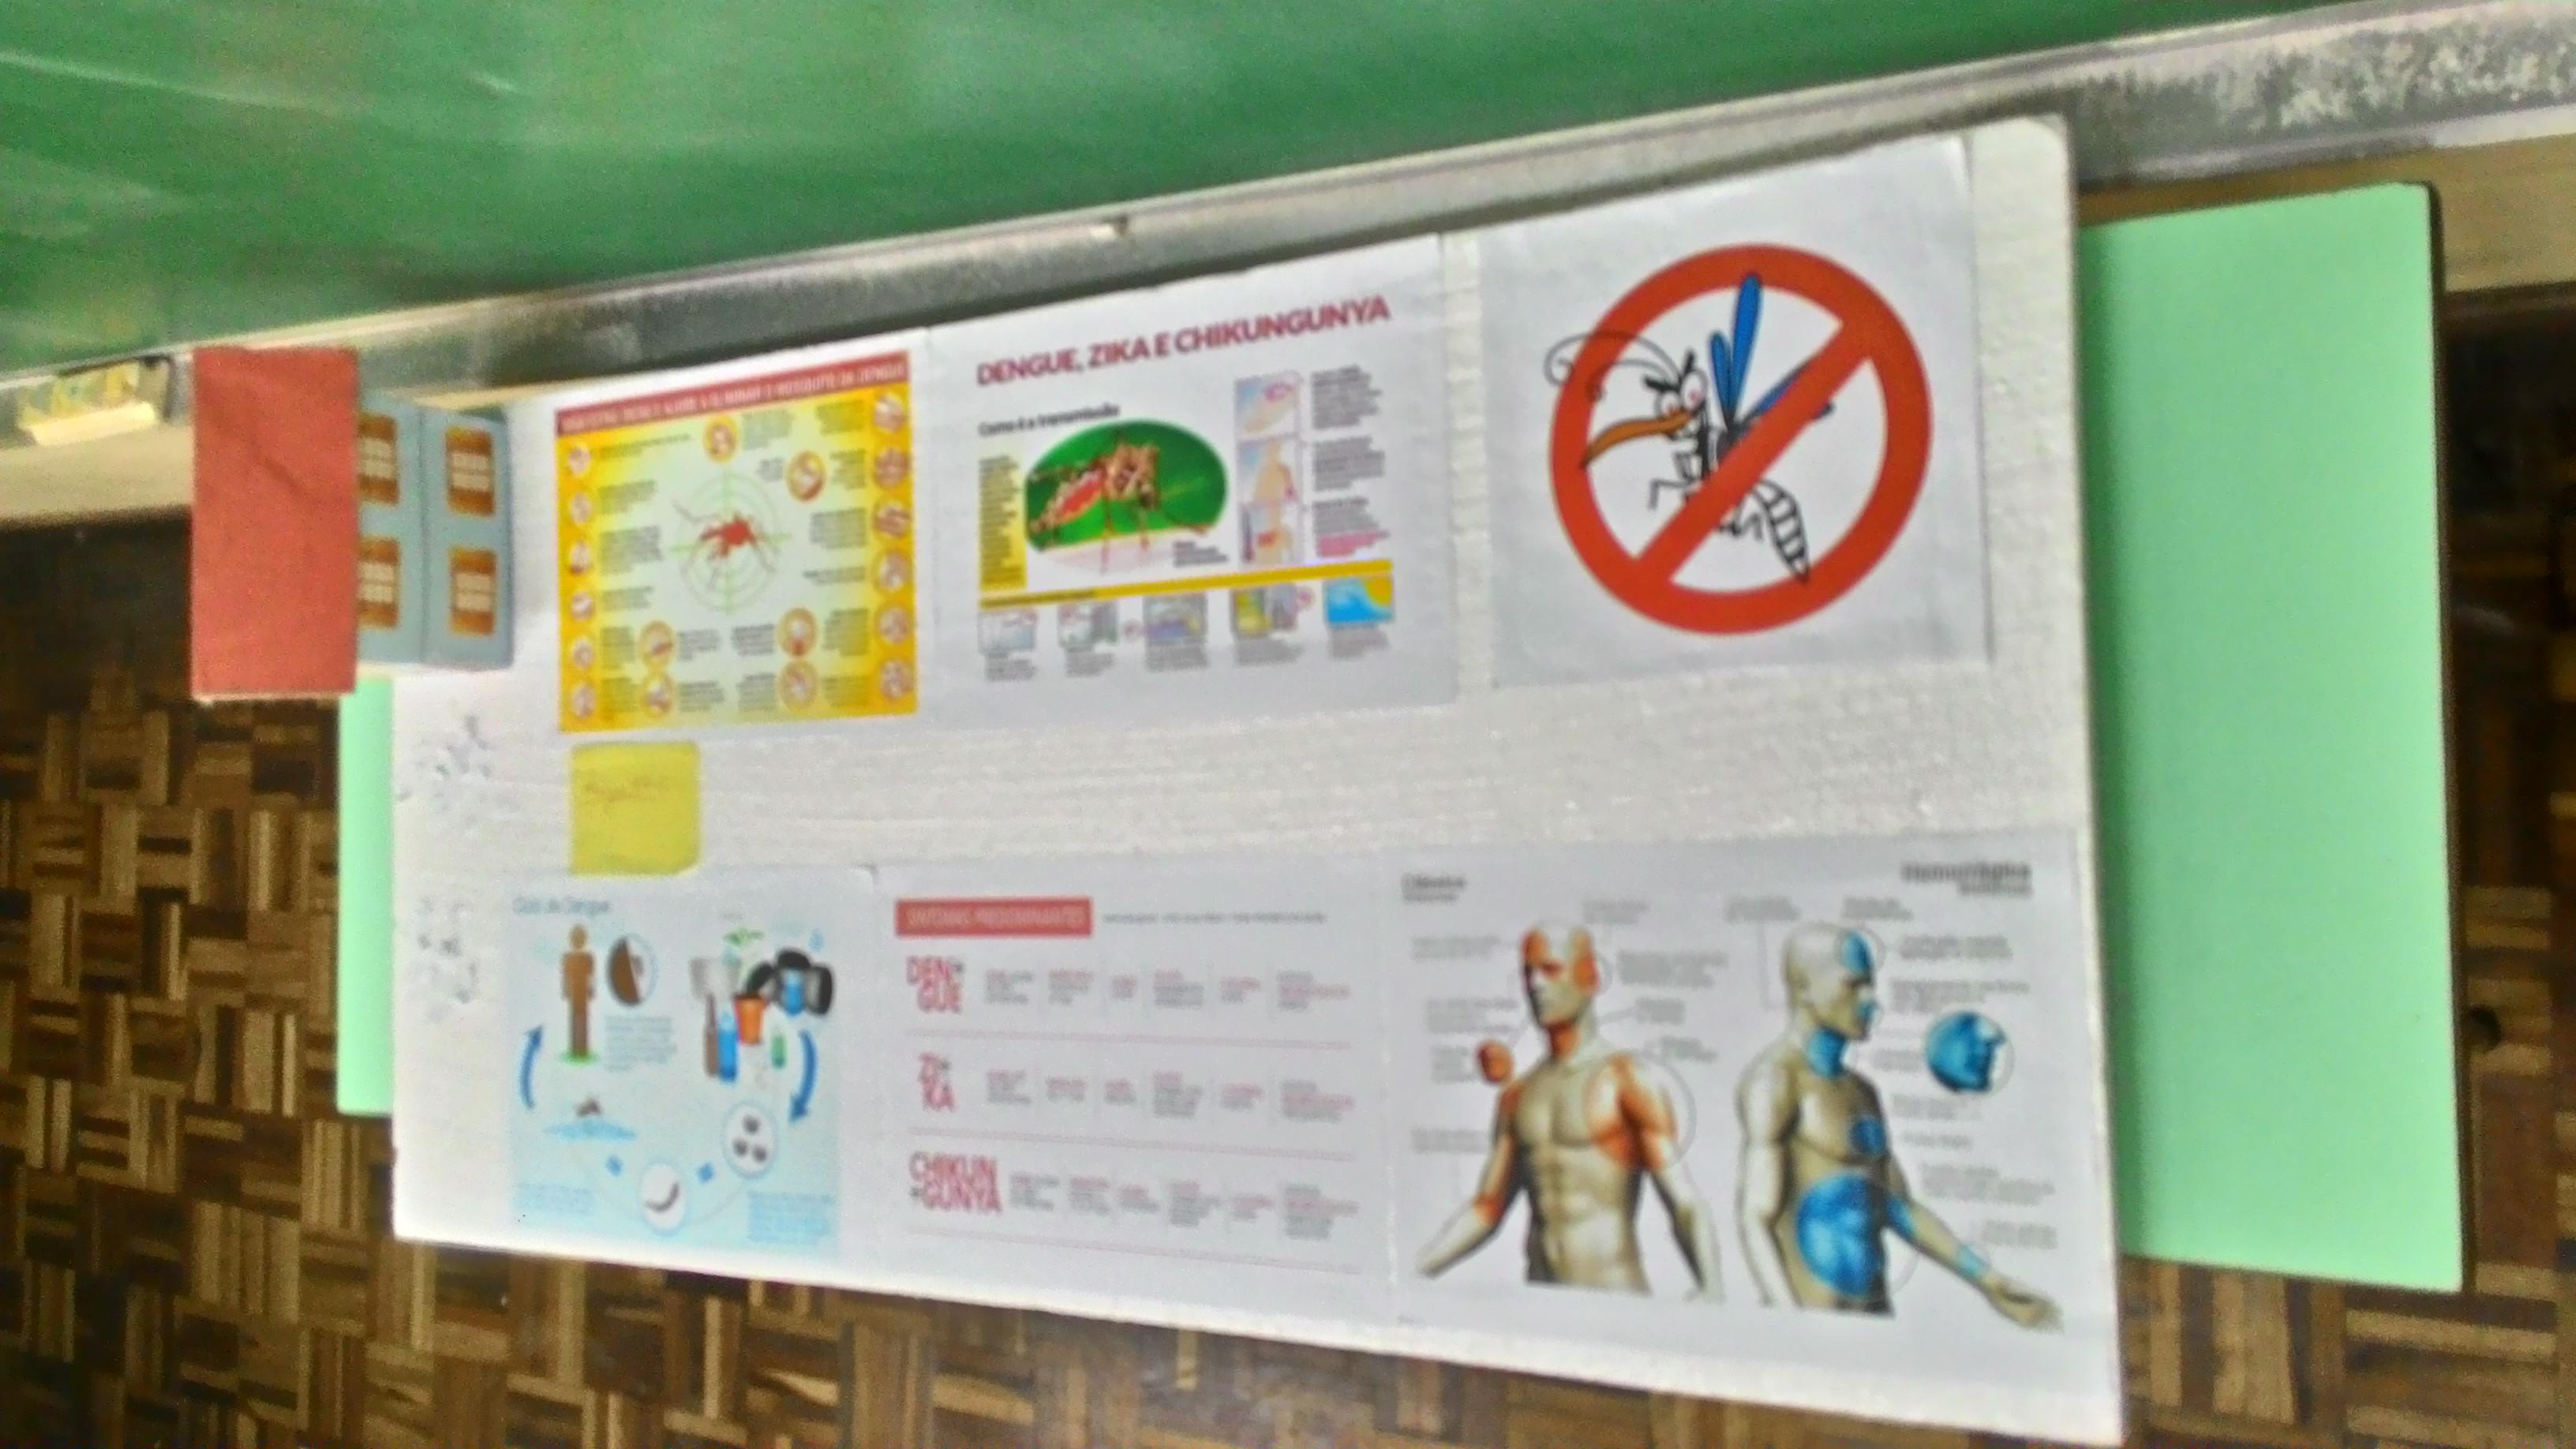 dengue 2/cartaz